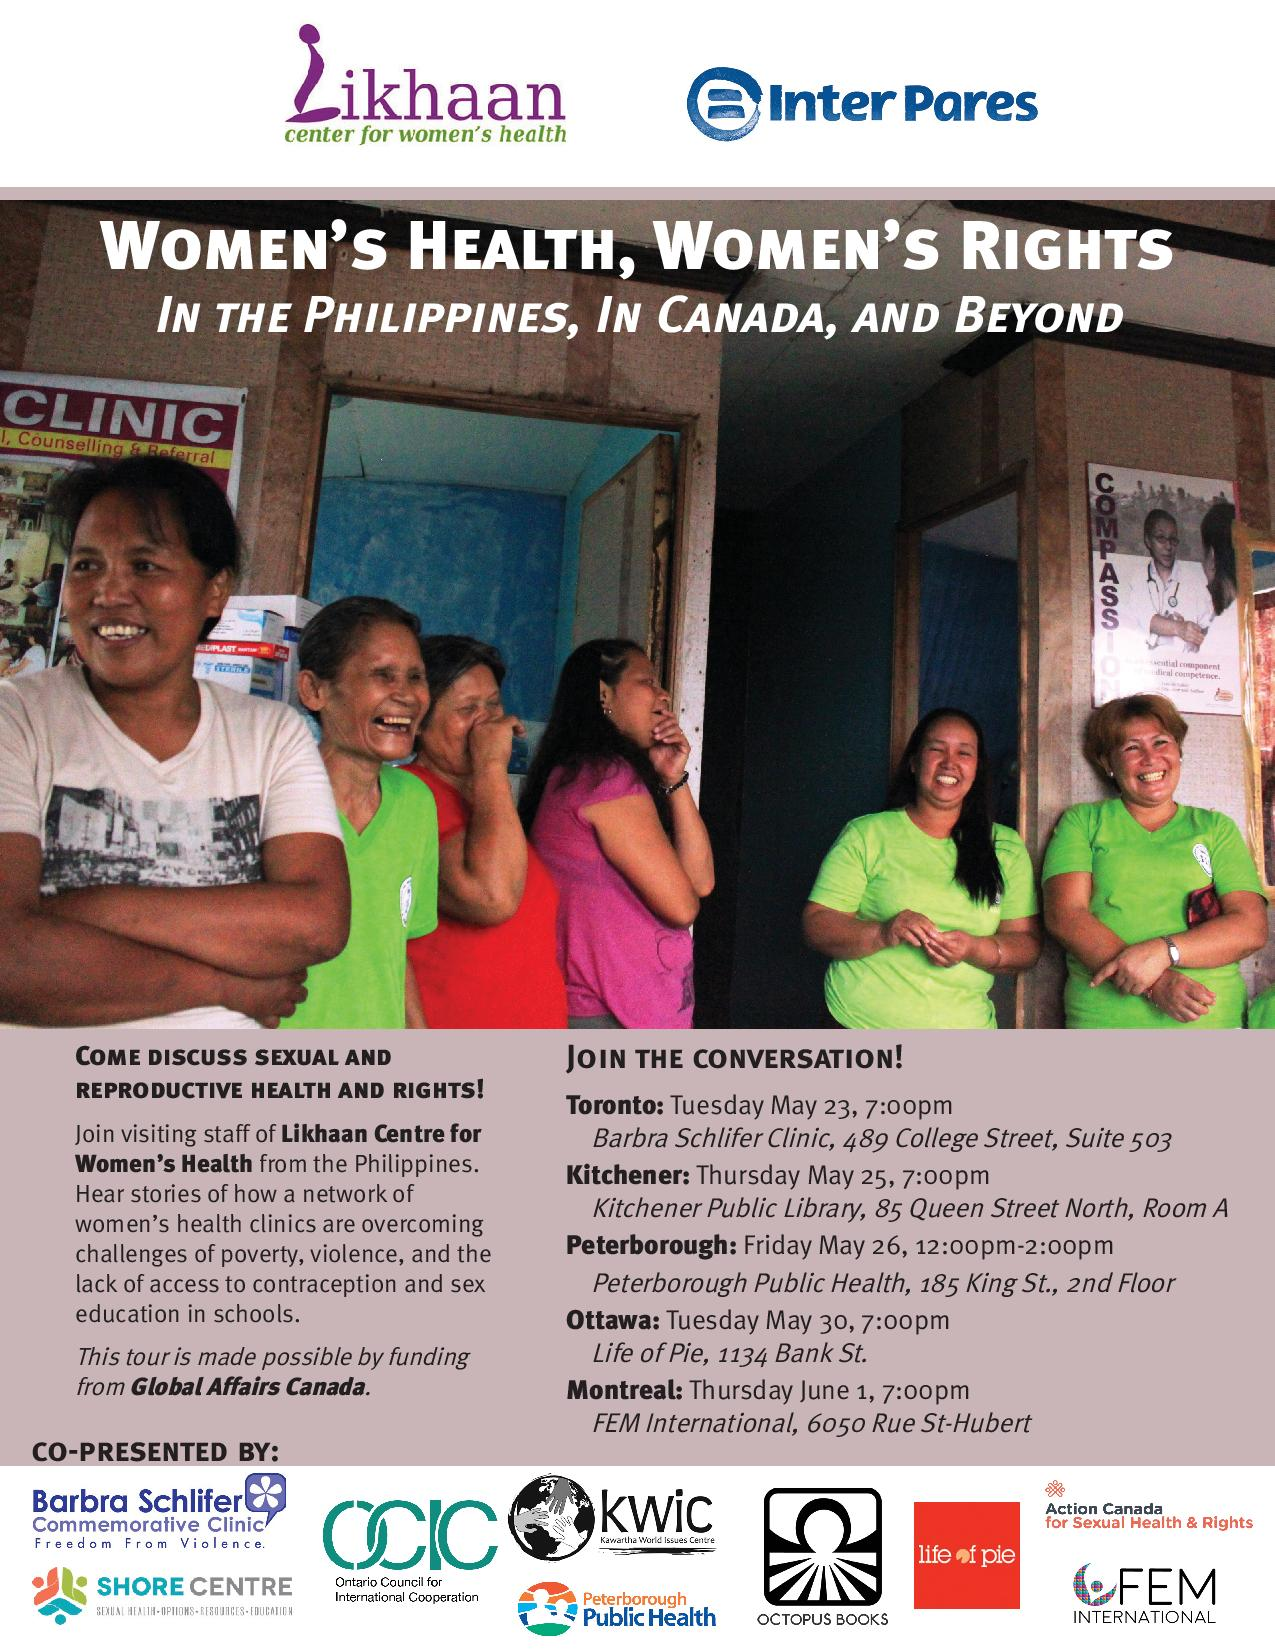 Women's Health, Women's Rights May 26